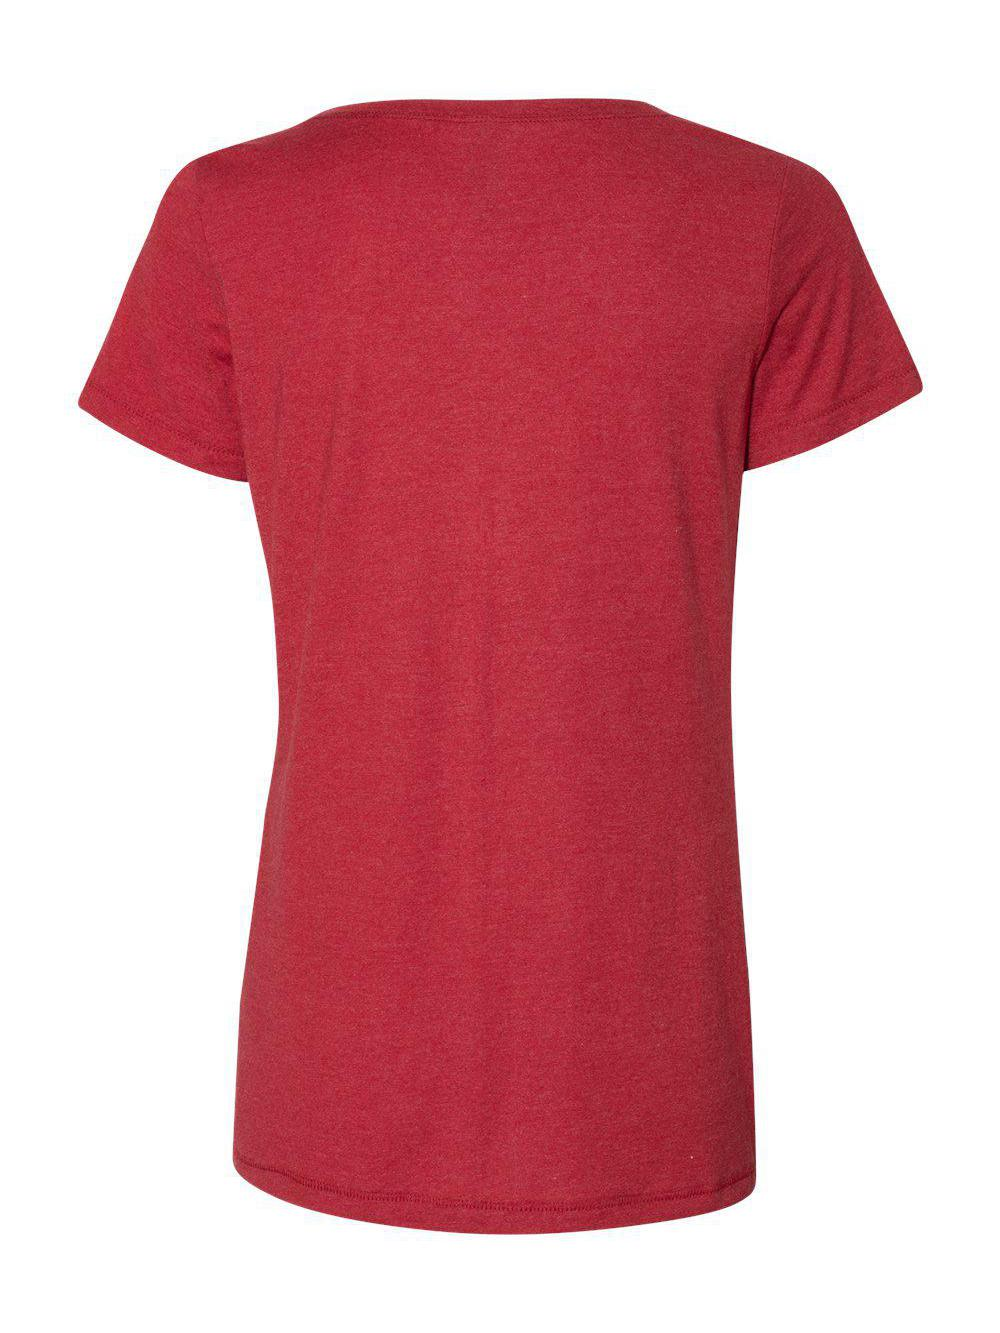 Hanes-Women-039-s-Modal-Triblend-T-Shirt-MO150 thumbnail 6